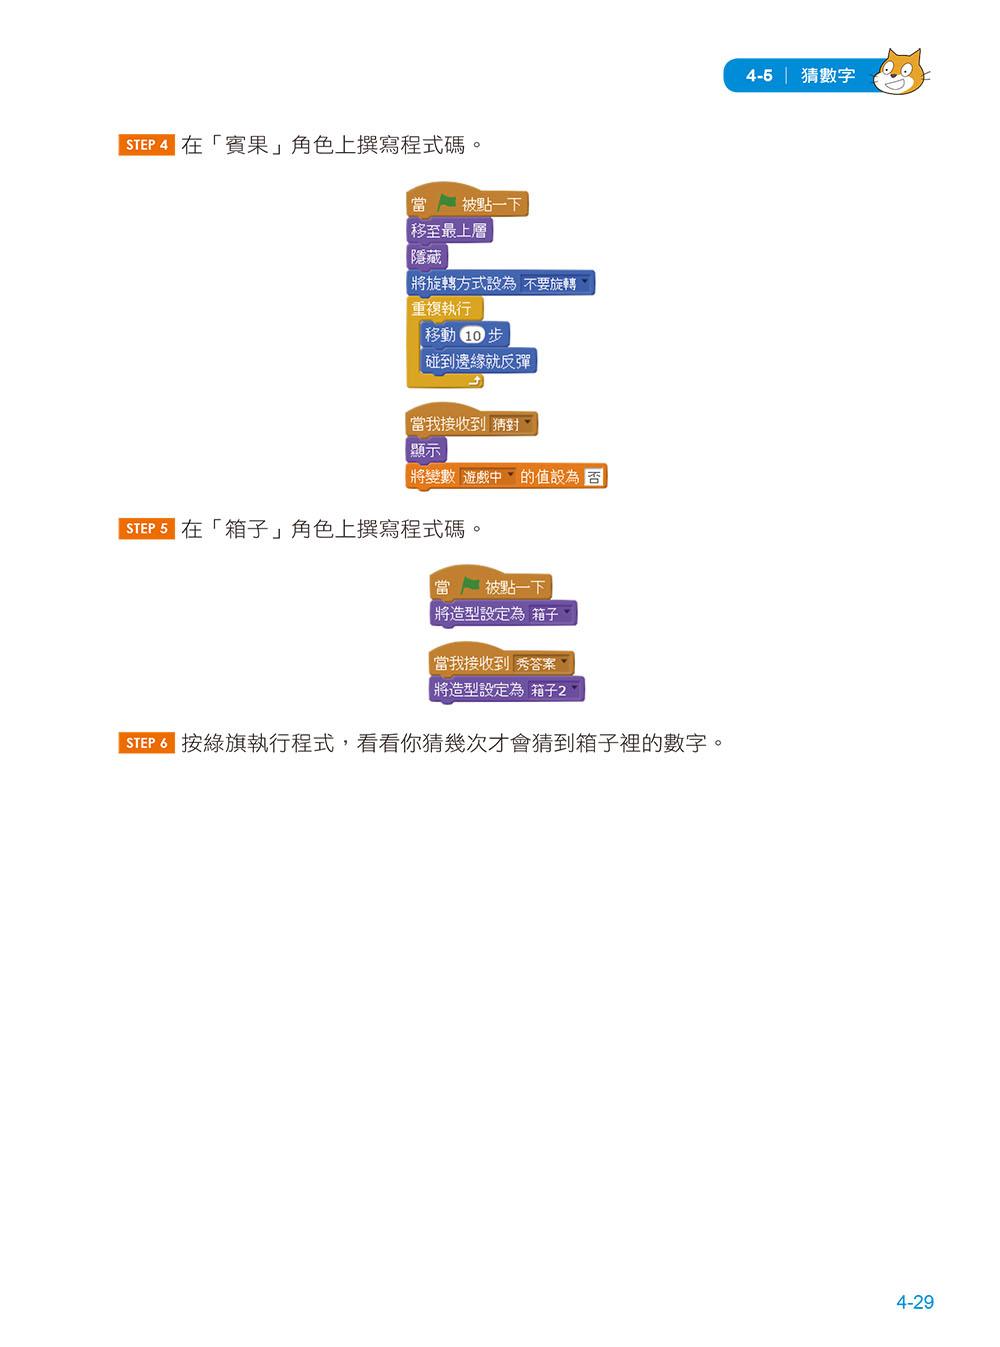 http://im2.book.com.tw/image/getImage?i=http://www.books.com.tw/img/001/070/34/0010703424_b_05.jpg&v=5694f1dd&w=655&h=609